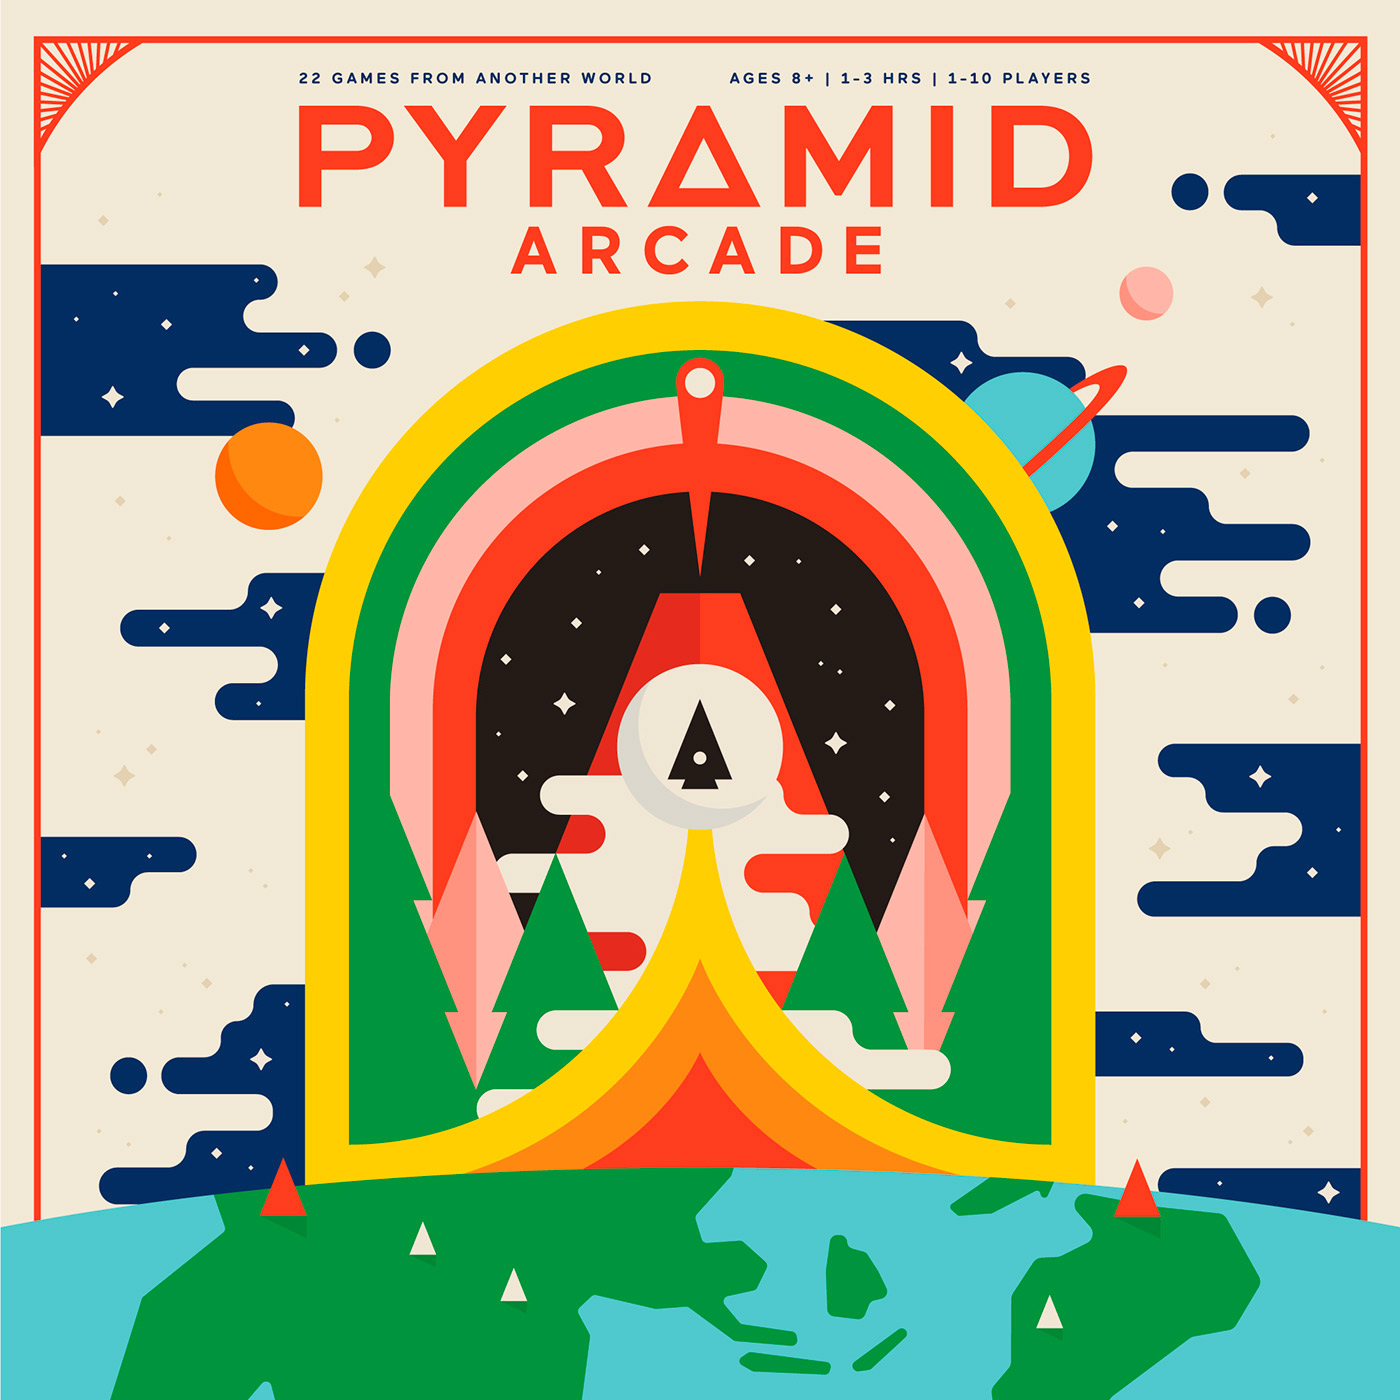 Pyramid Arcade - Branding, Print, Packaging Design Inspiration